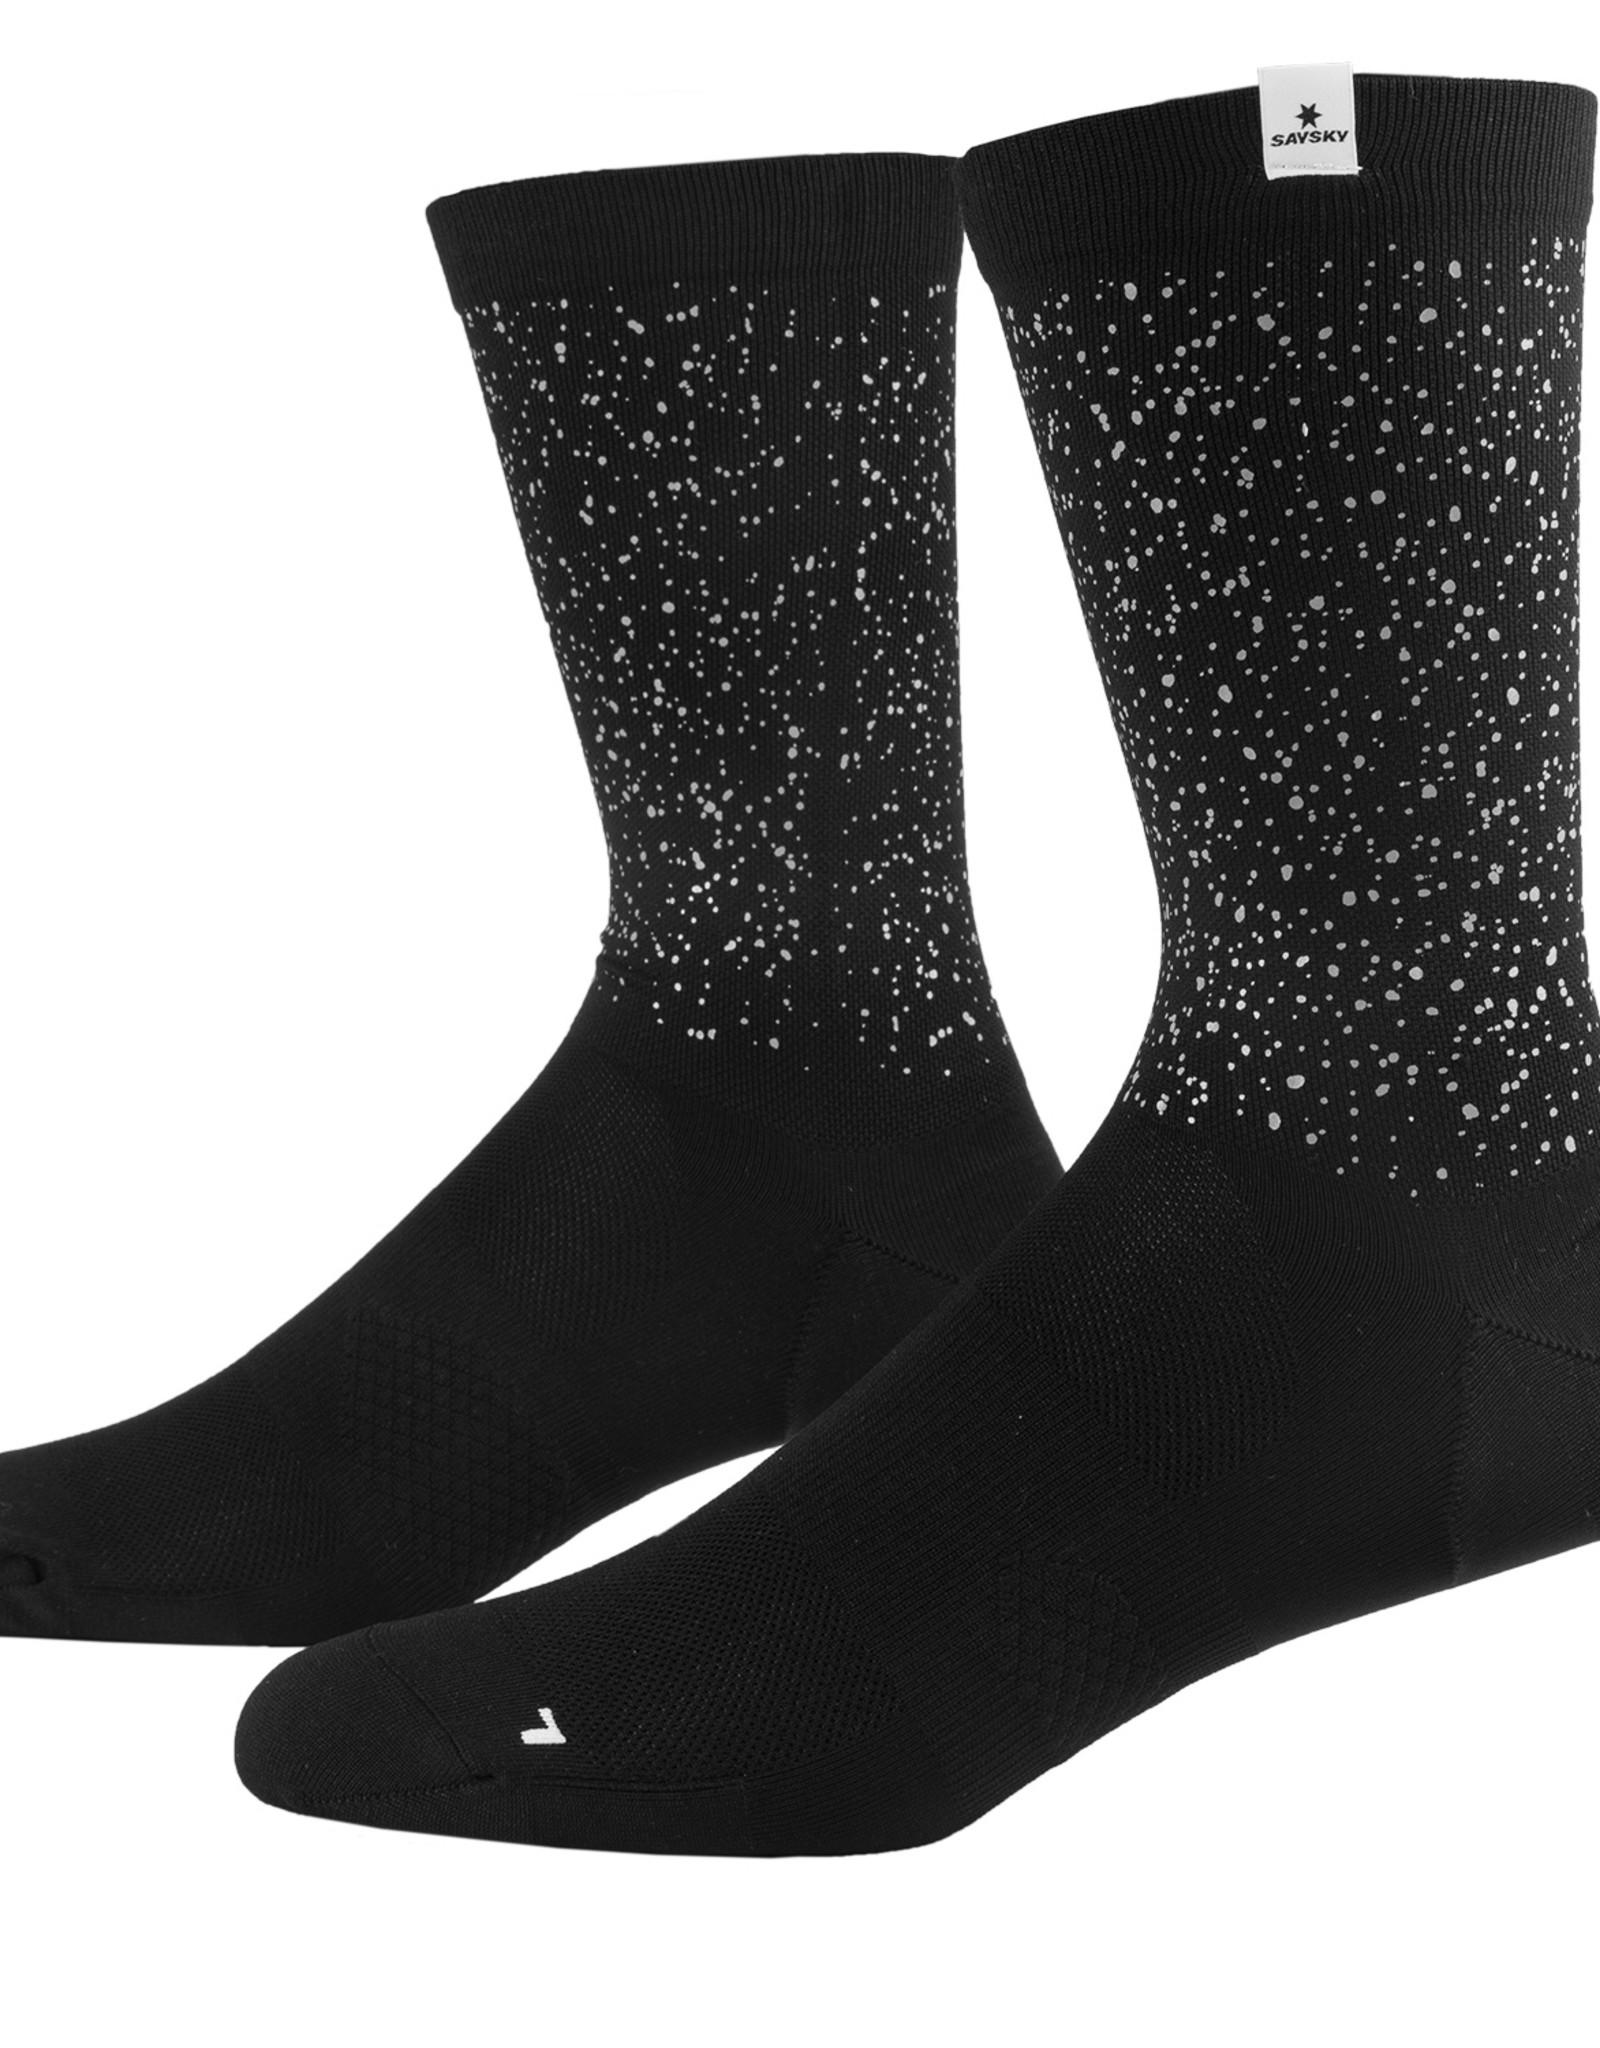 Saysky Reflective high combat socks (DMASO2)